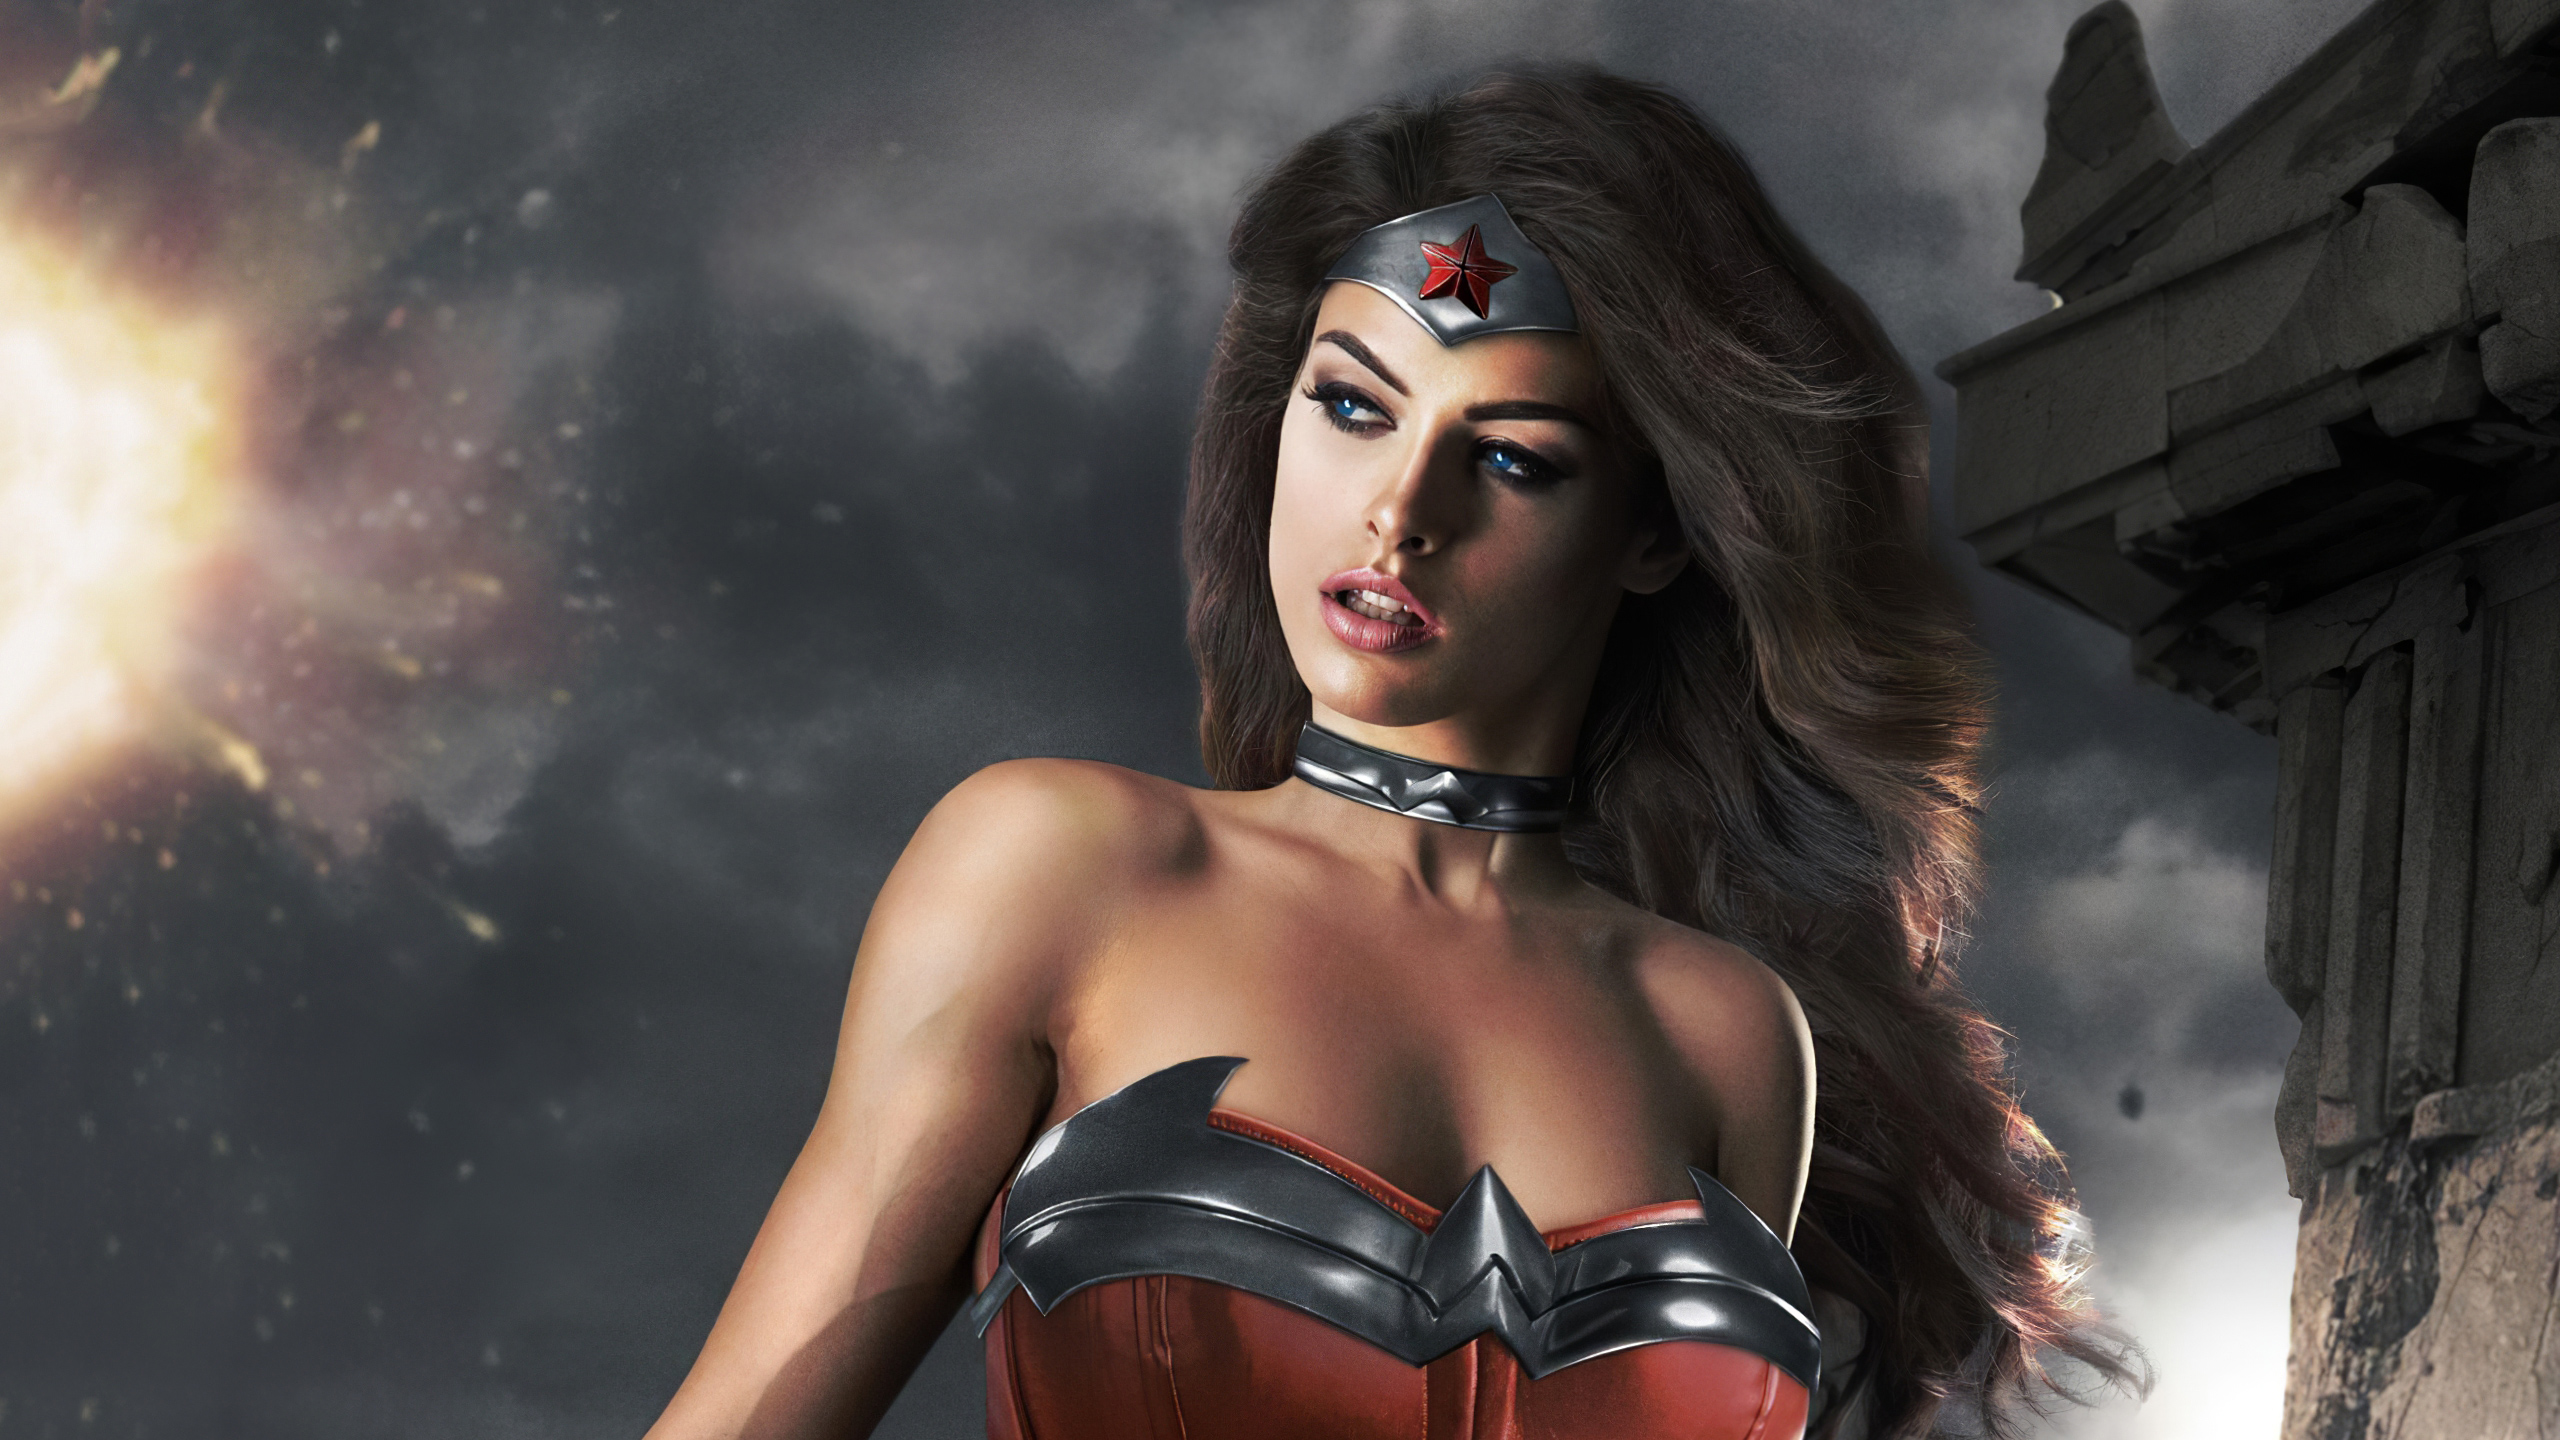 Wallpaper Wonder Woman Cosplay